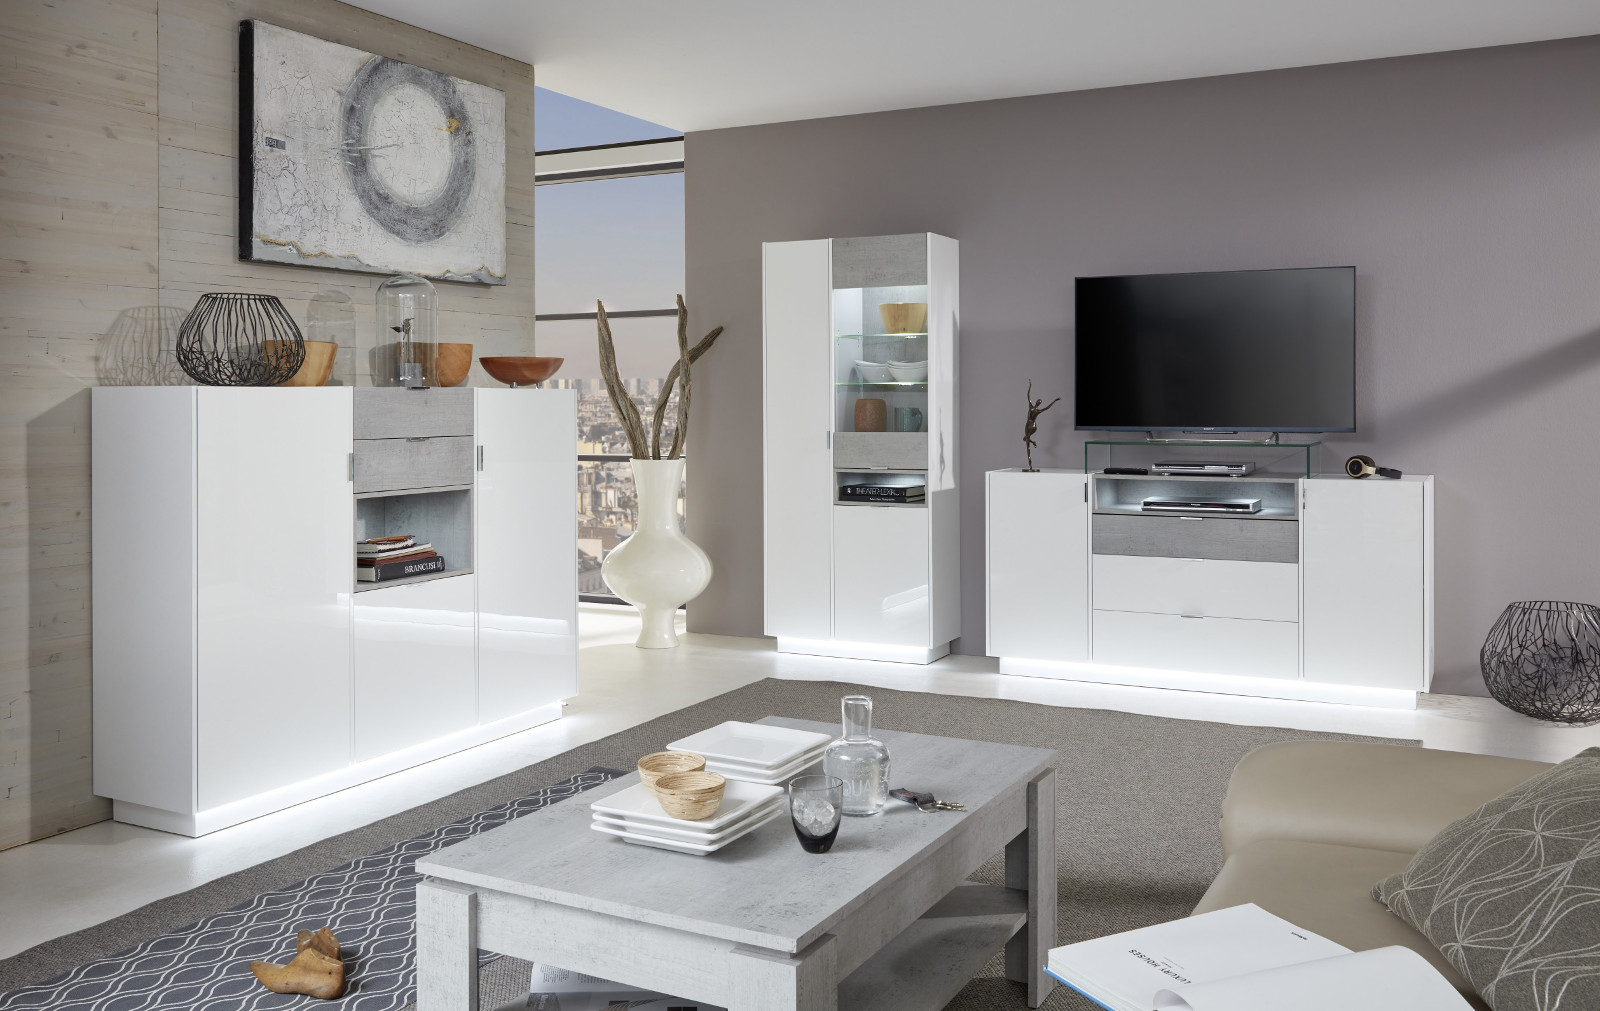 highboard atlanta in hochglanz wei und stone grau. Black Bedroom Furniture Sets. Home Design Ideas